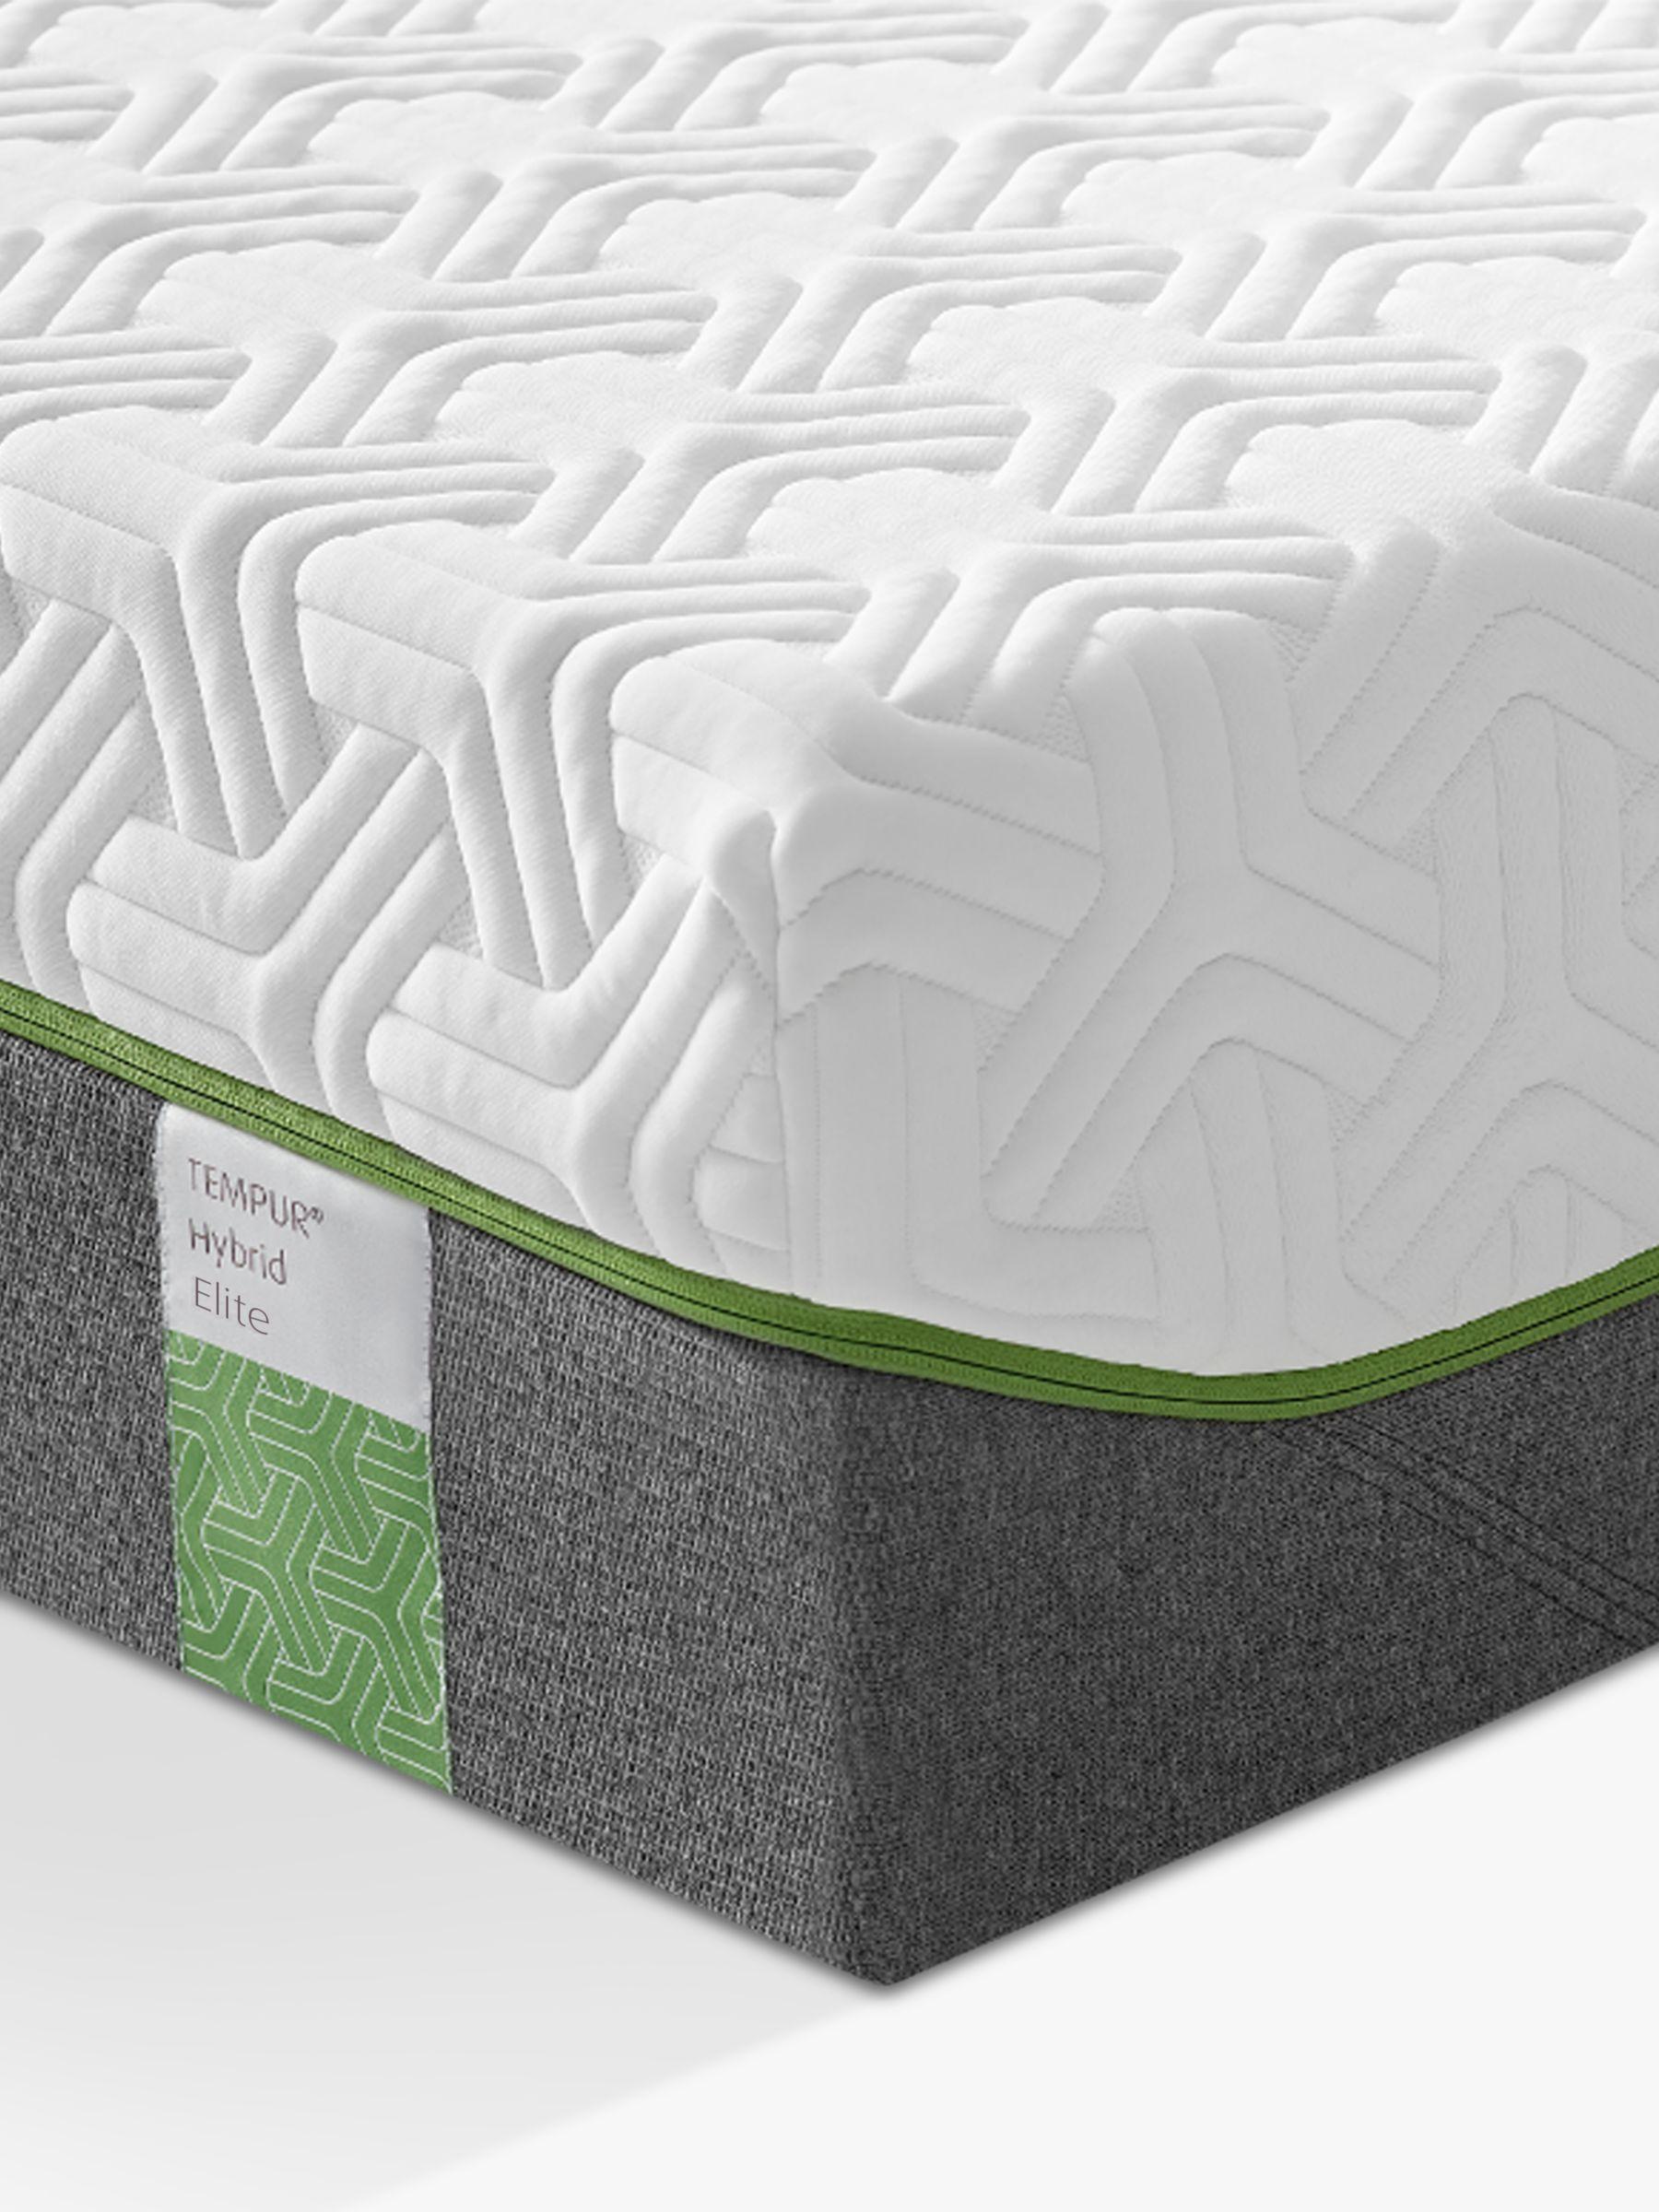 Tempur Tempur Hybrid Elite Pocket Spring Memory Foam Mattress, Super King Size